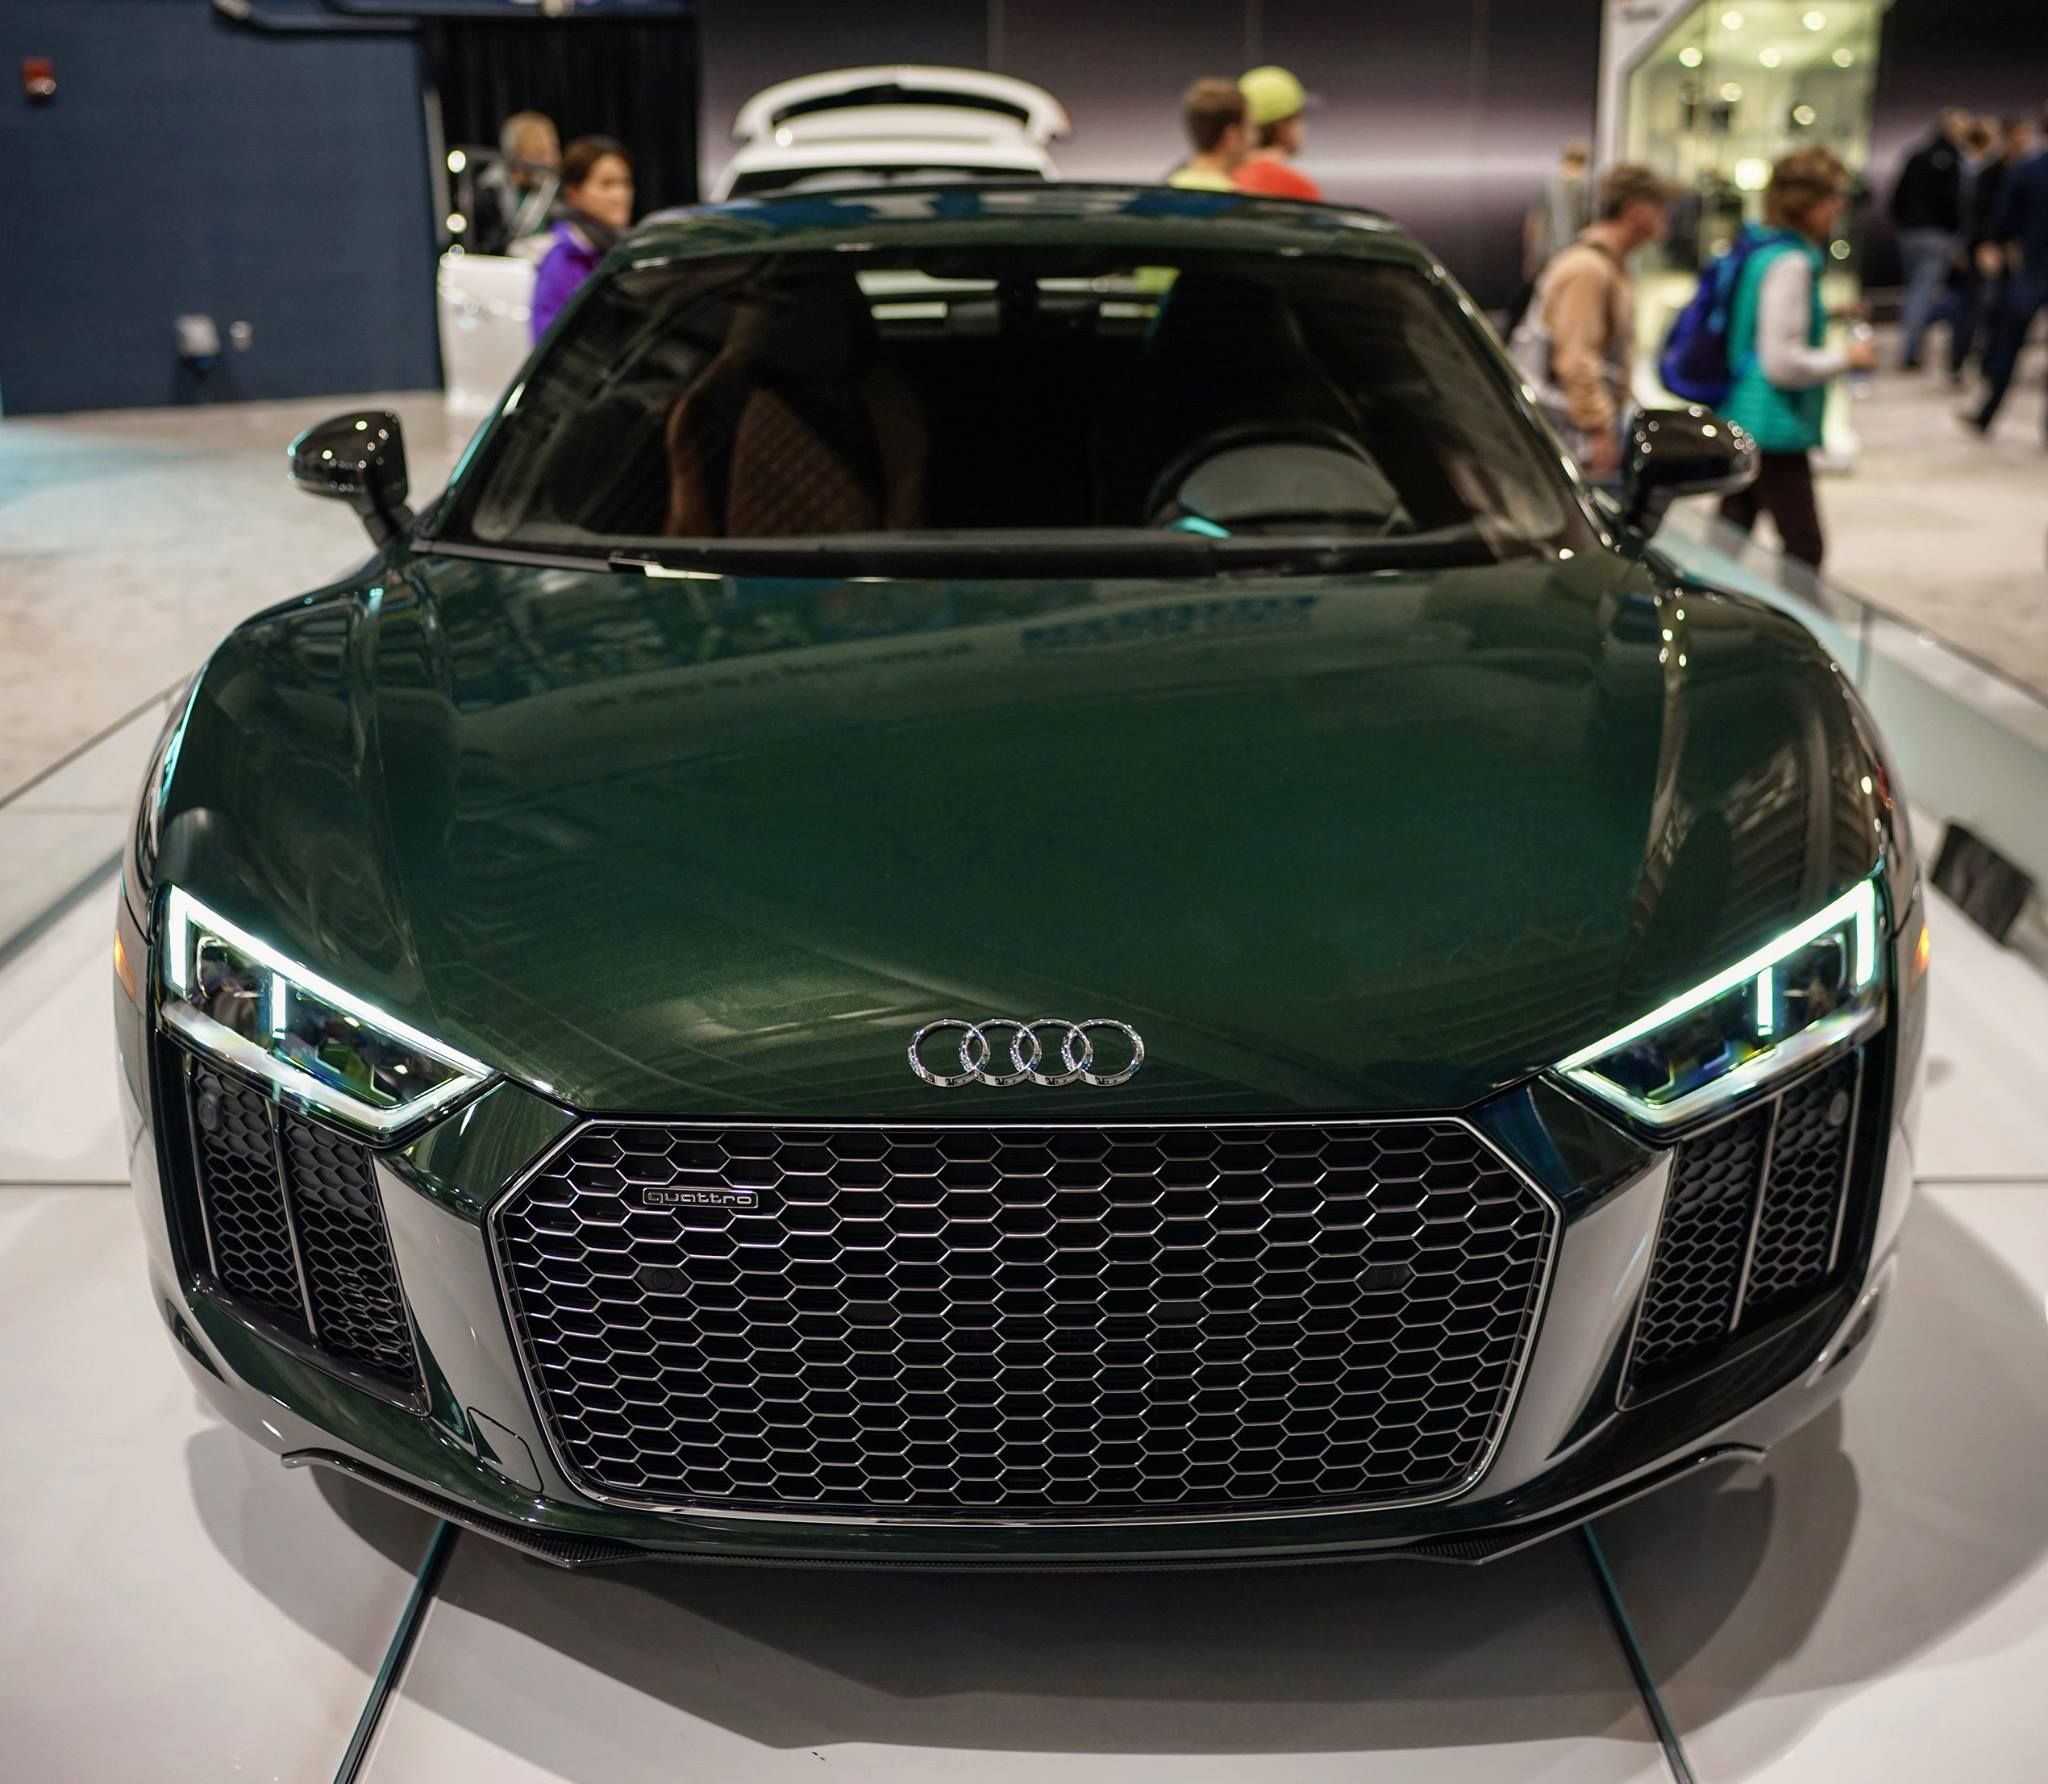 Goodwood Green Audi Exclusive V10 Plus